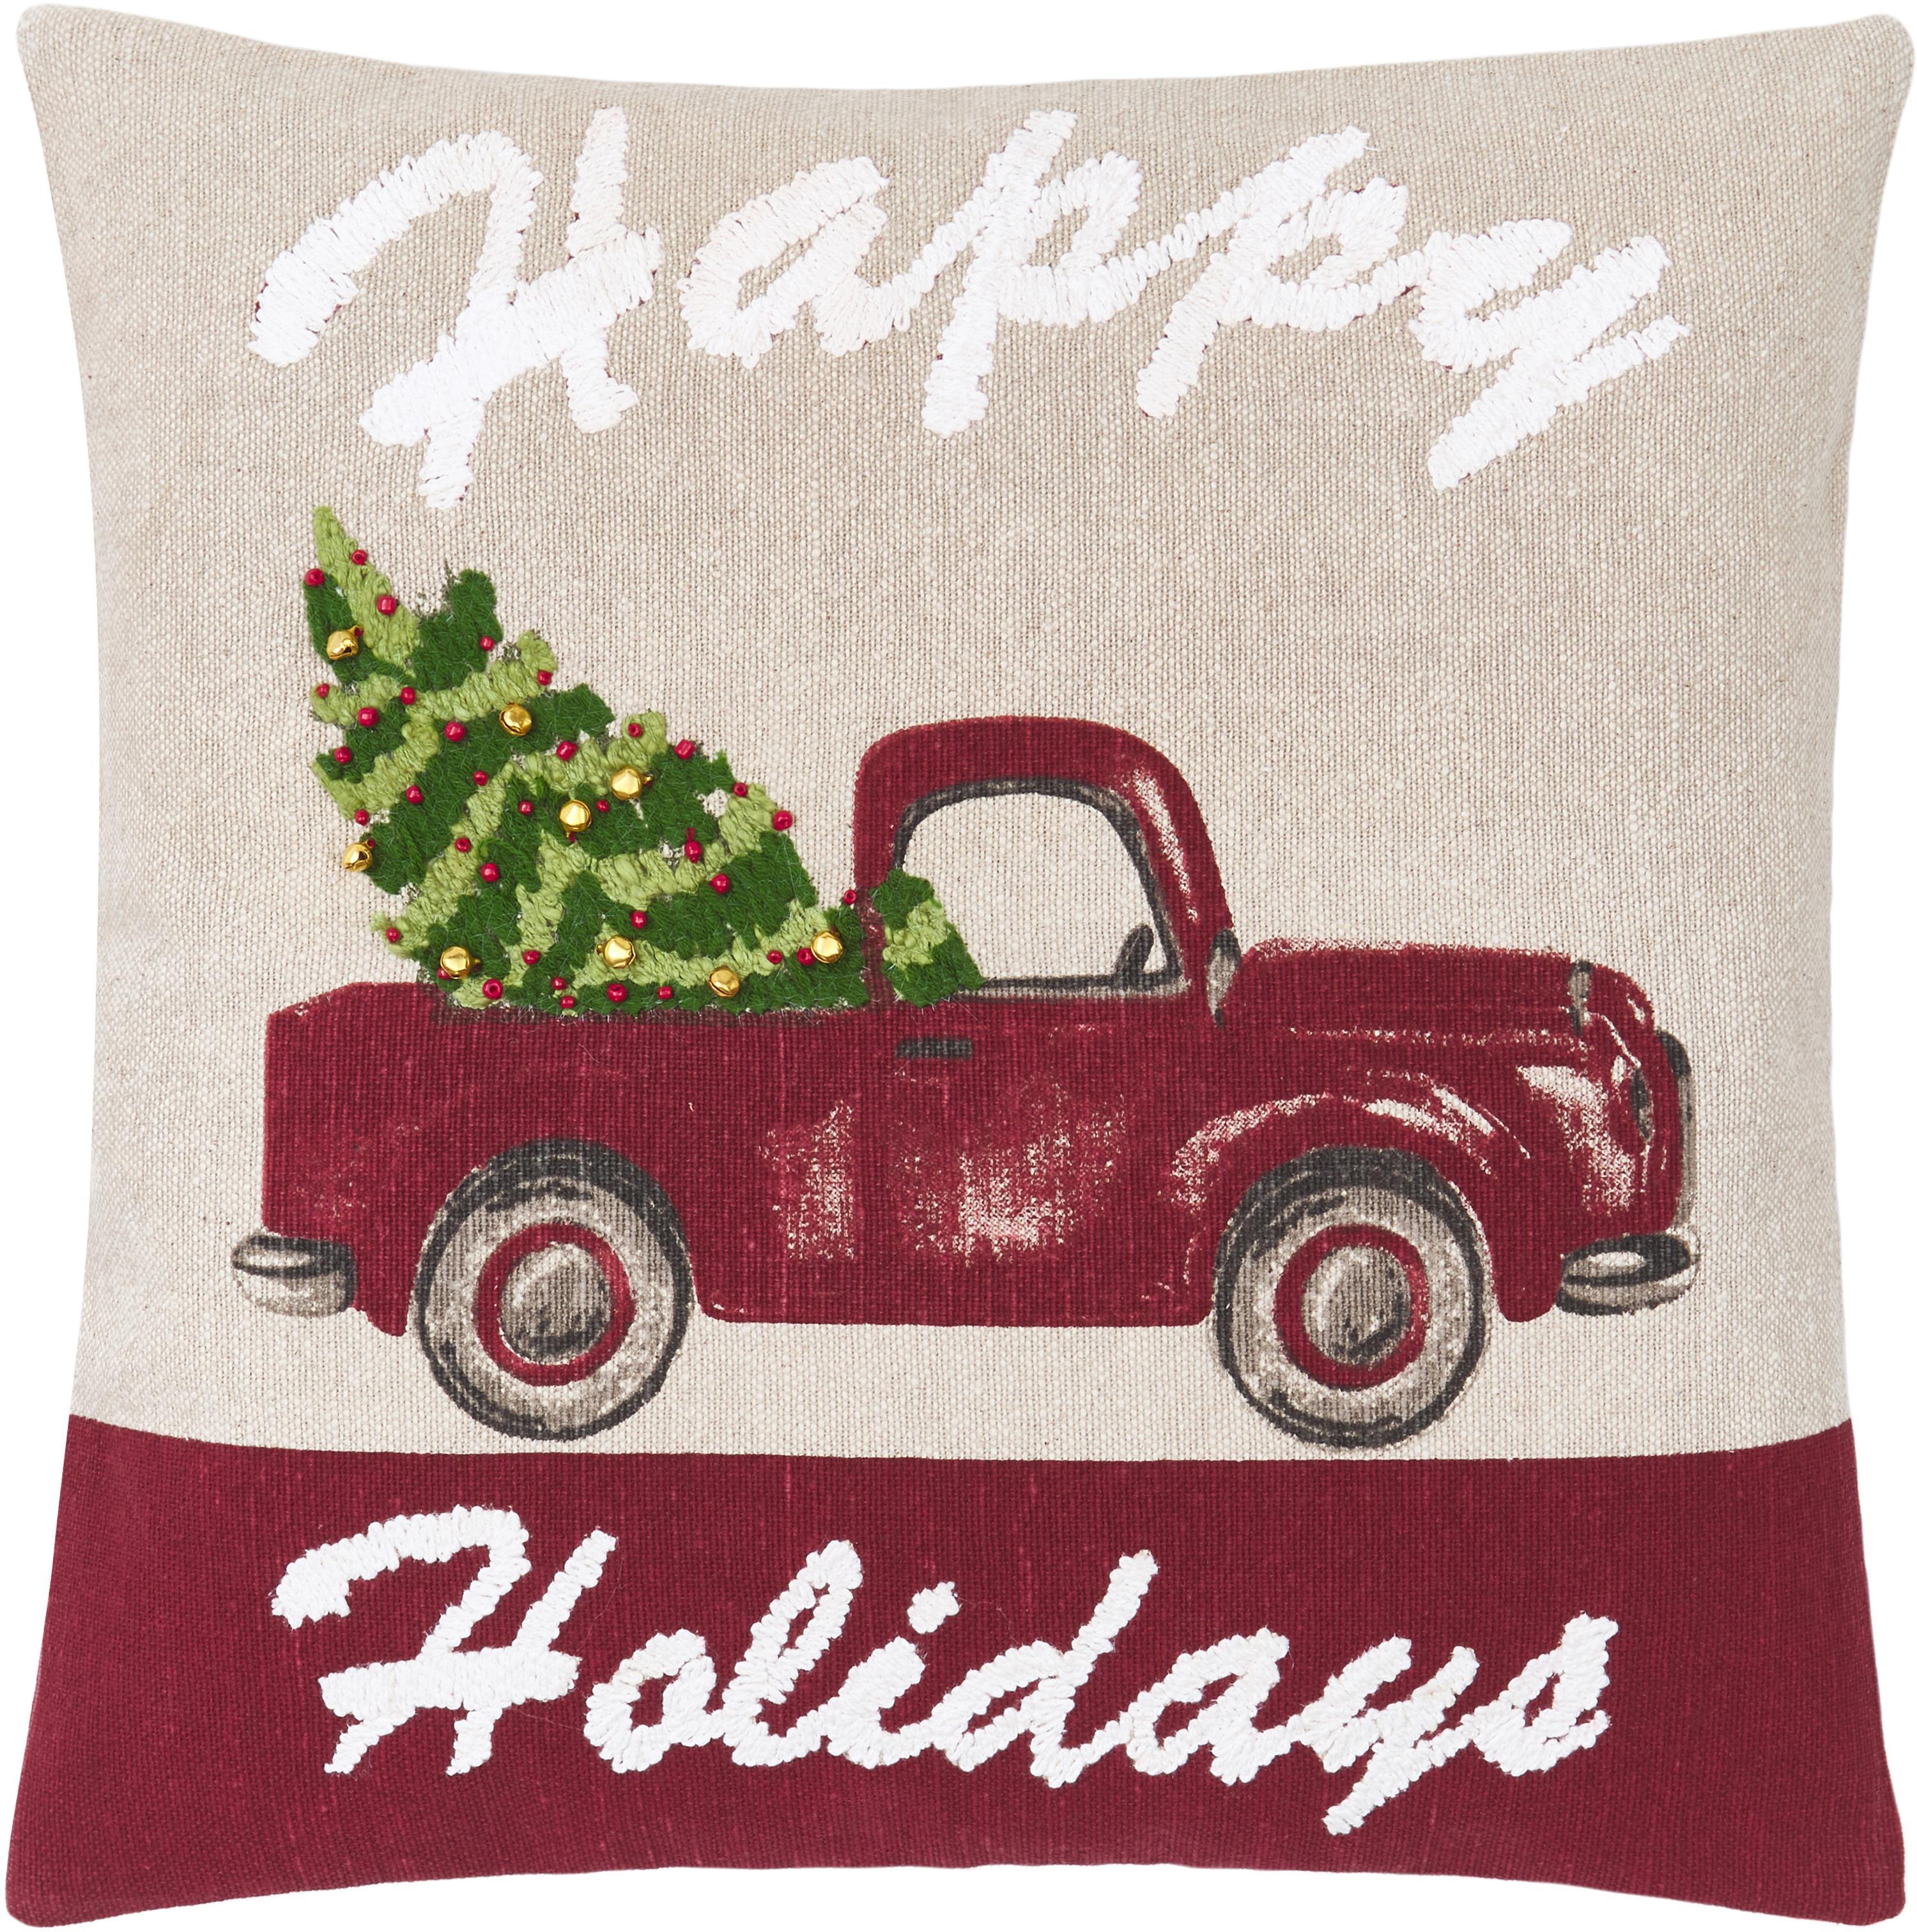 Funda de cojín Happy Holidays, Algodón, Beige, rojo, verde, An 45 x L 45 cm